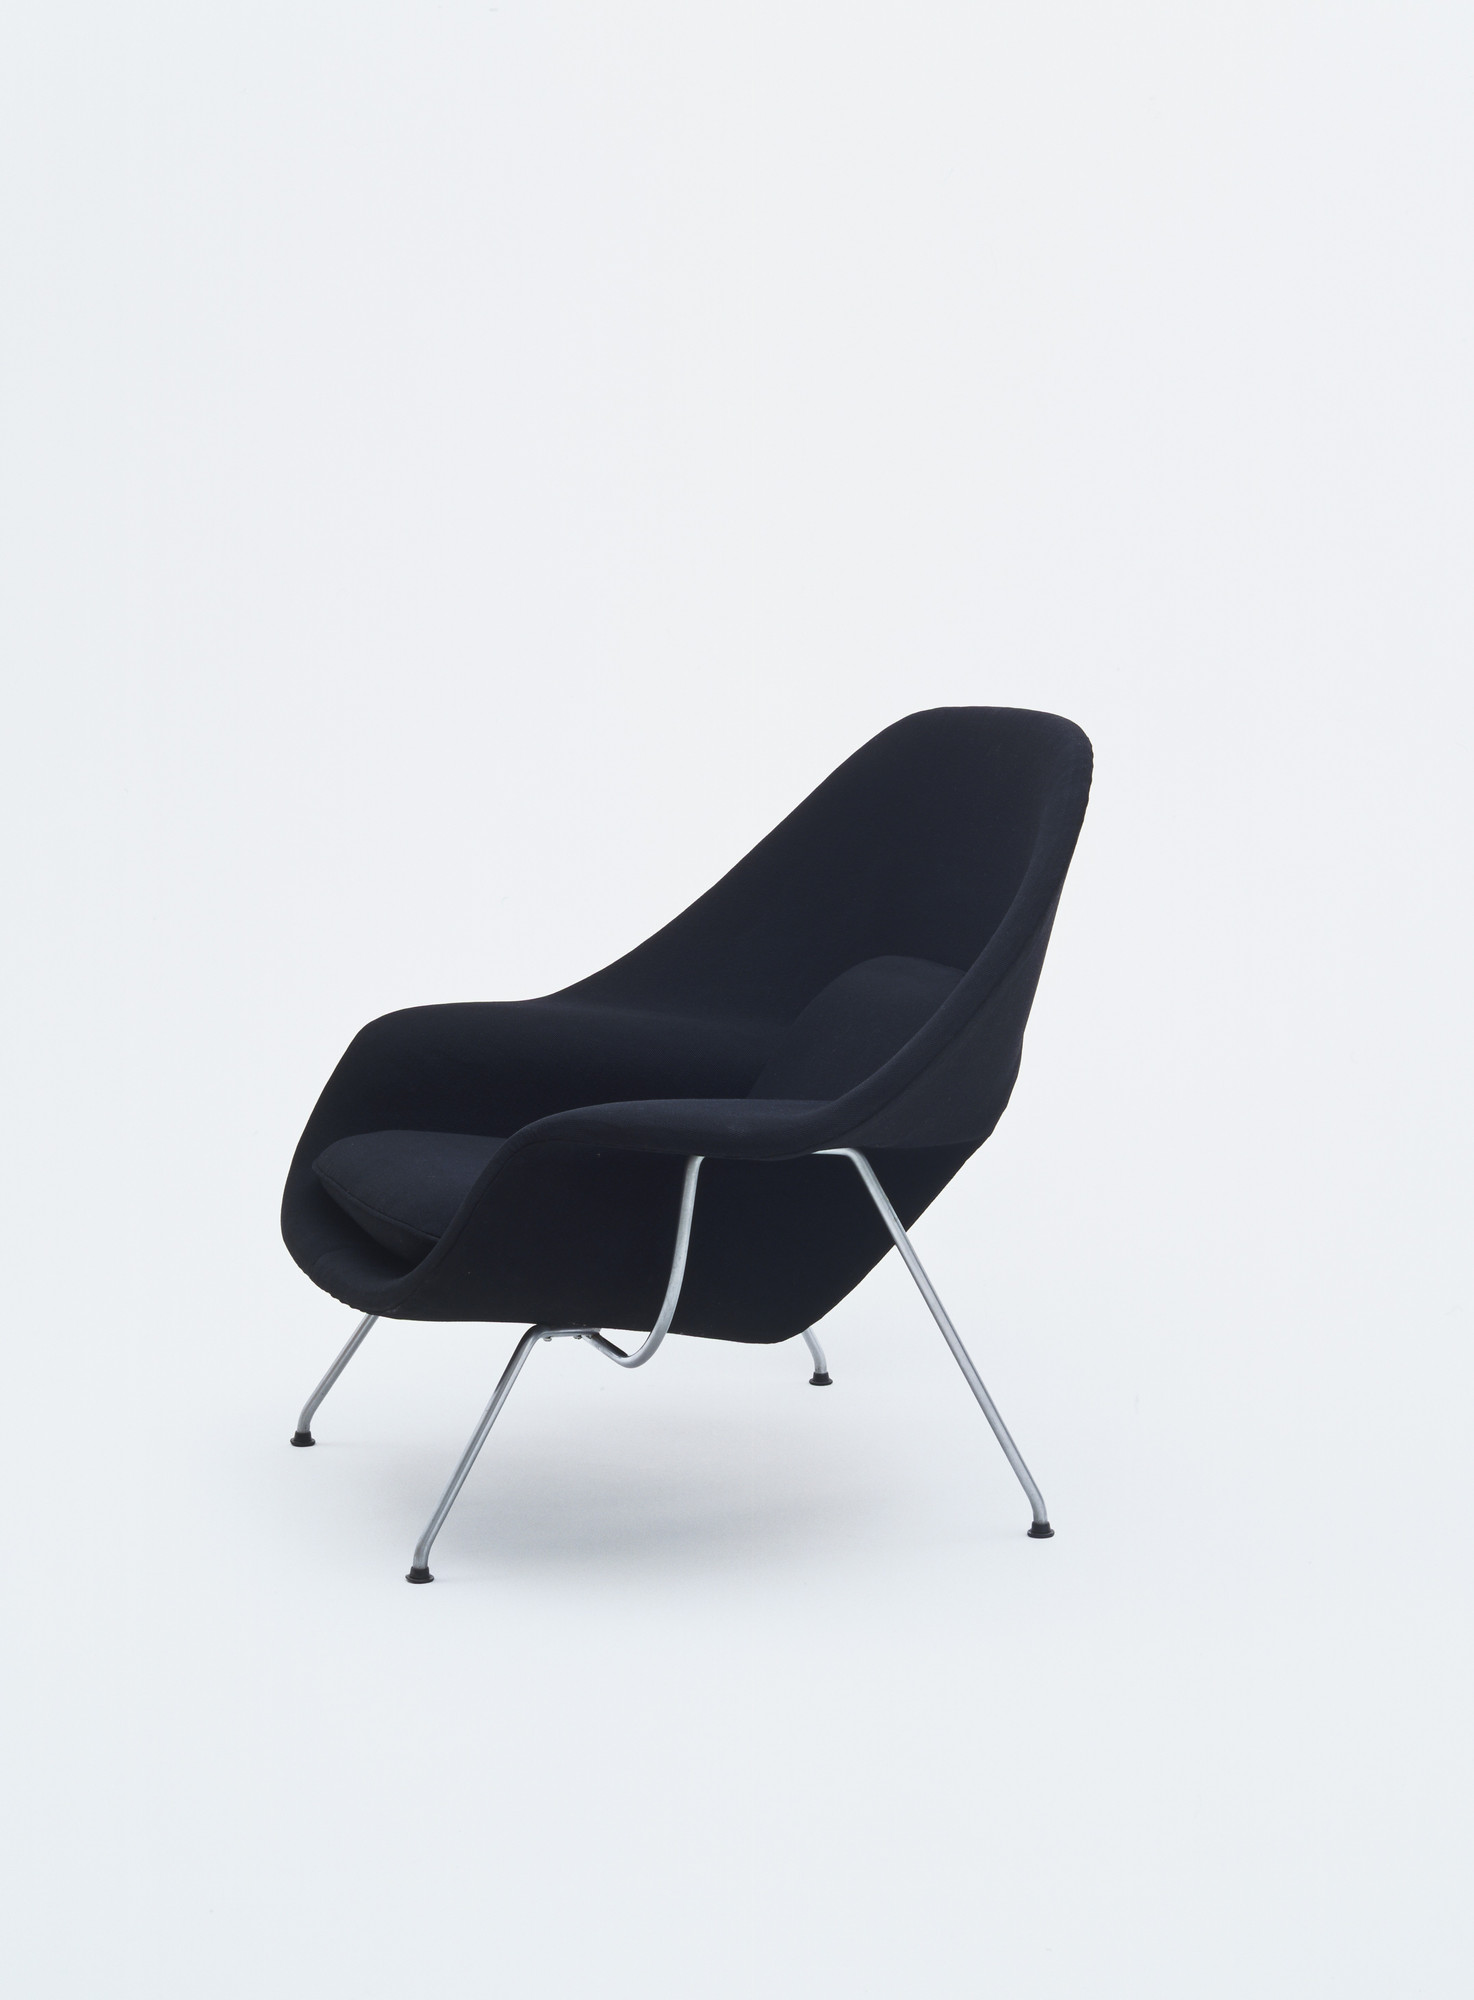 Peachy Eero Saarinen Womb Chair Exhibited In The Us Pavilion In Machost Co Dining Chair Design Ideas Machostcouk